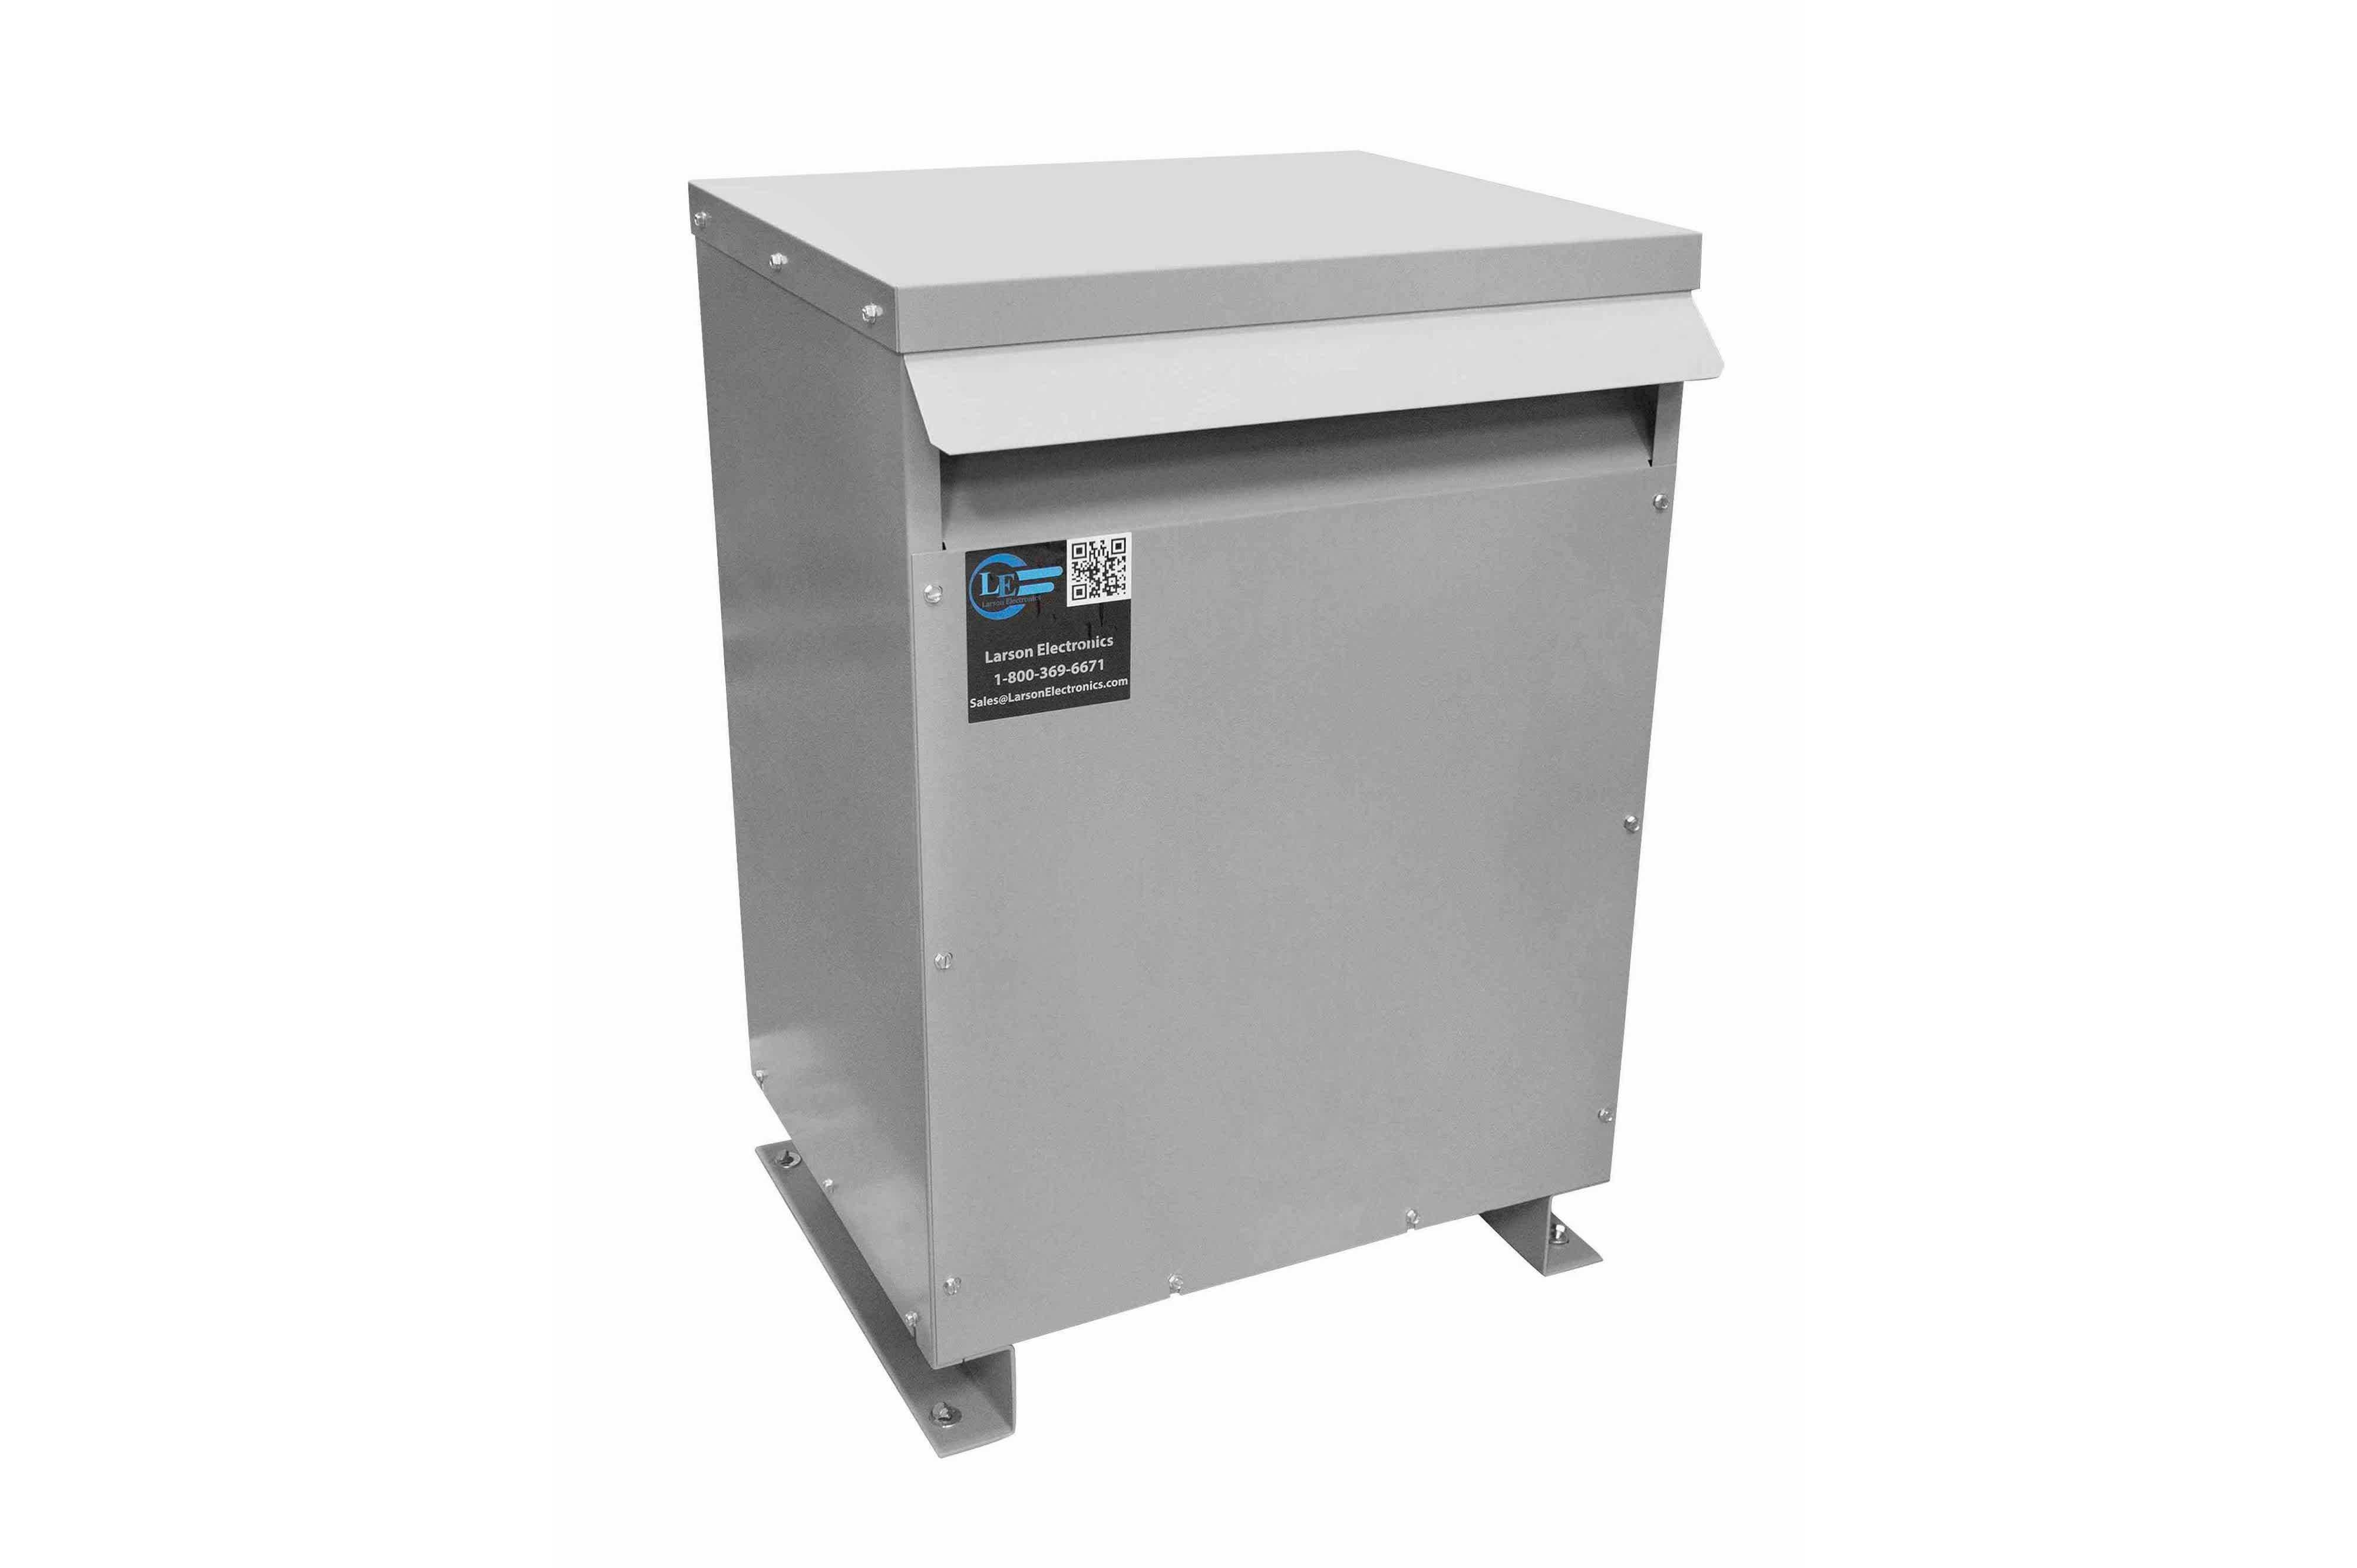 35 kVA 3PH Isolation Transformer, 460V Wye Primary, 600V Delta Secondary, N3R, Ventilated, 60 Hz